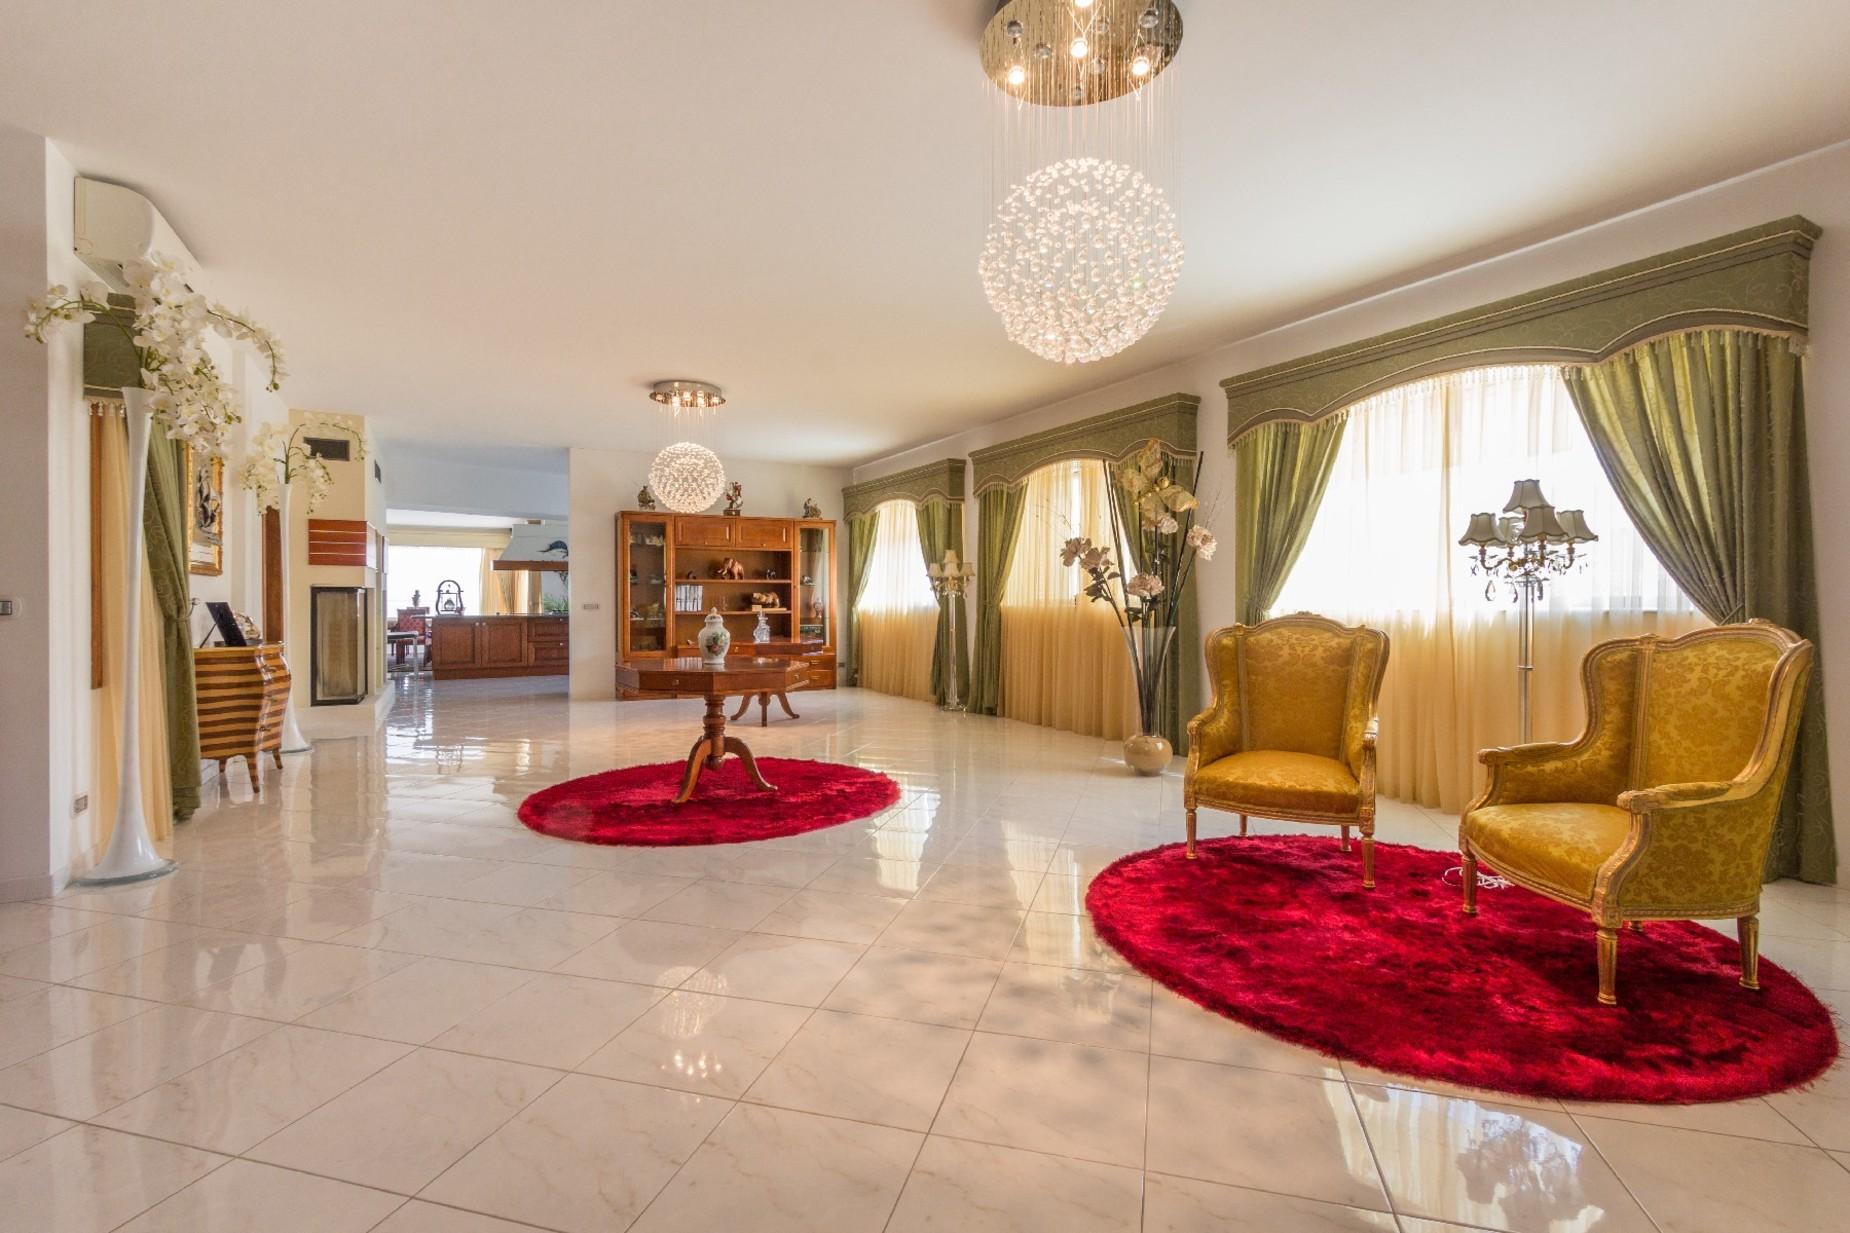 7 bed Villa For Rent in Mellieha, Mellieha - thumb 8